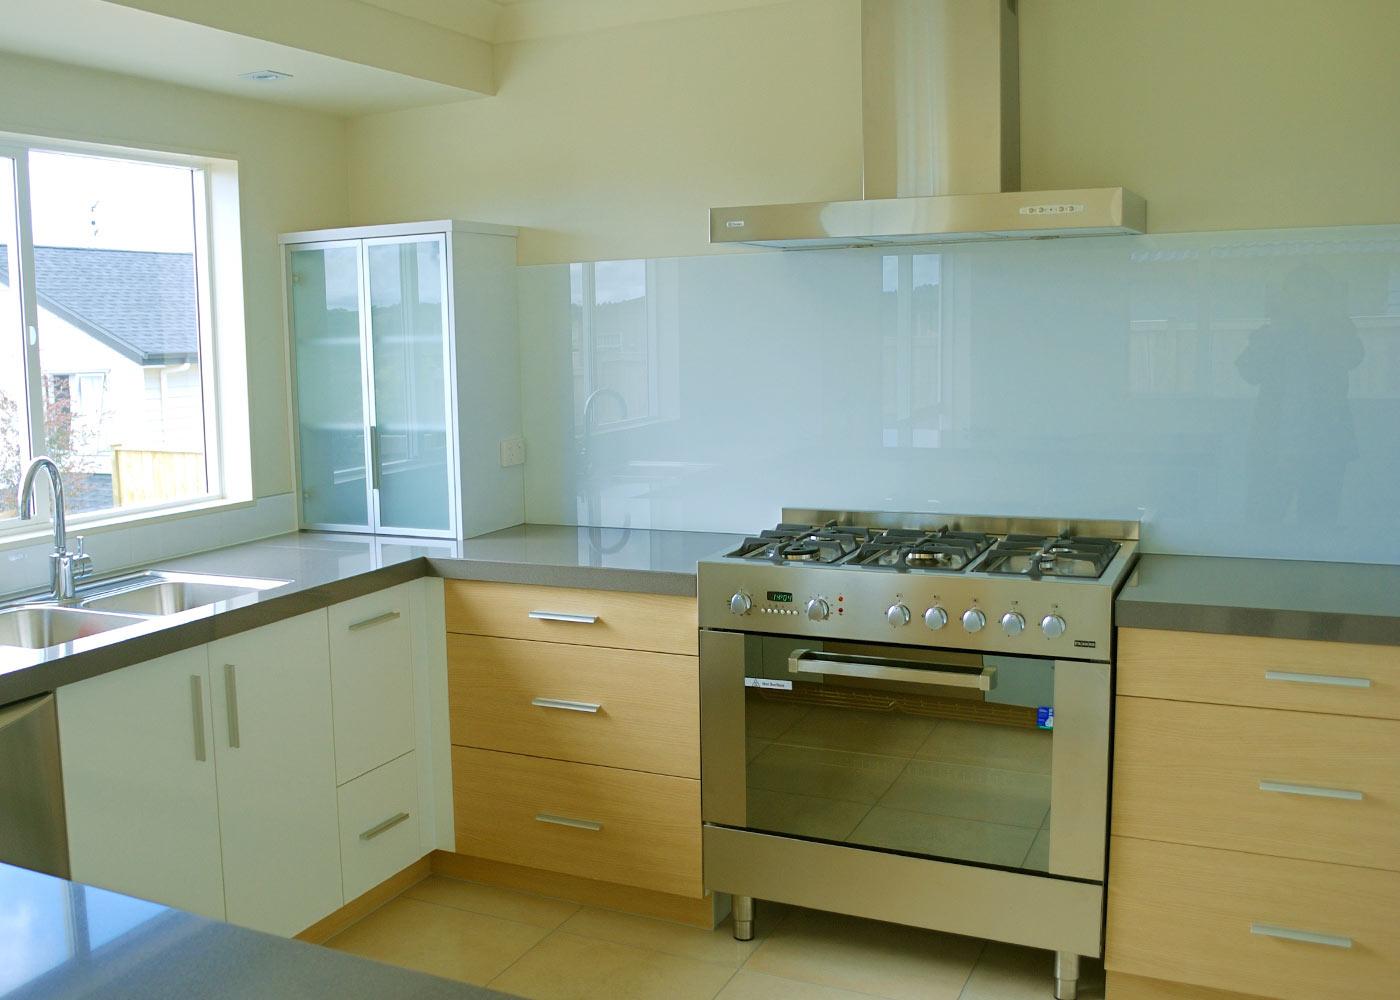 glass kitchen backsplash glass kitchen backsplash Simple and clear kitchen backsplash